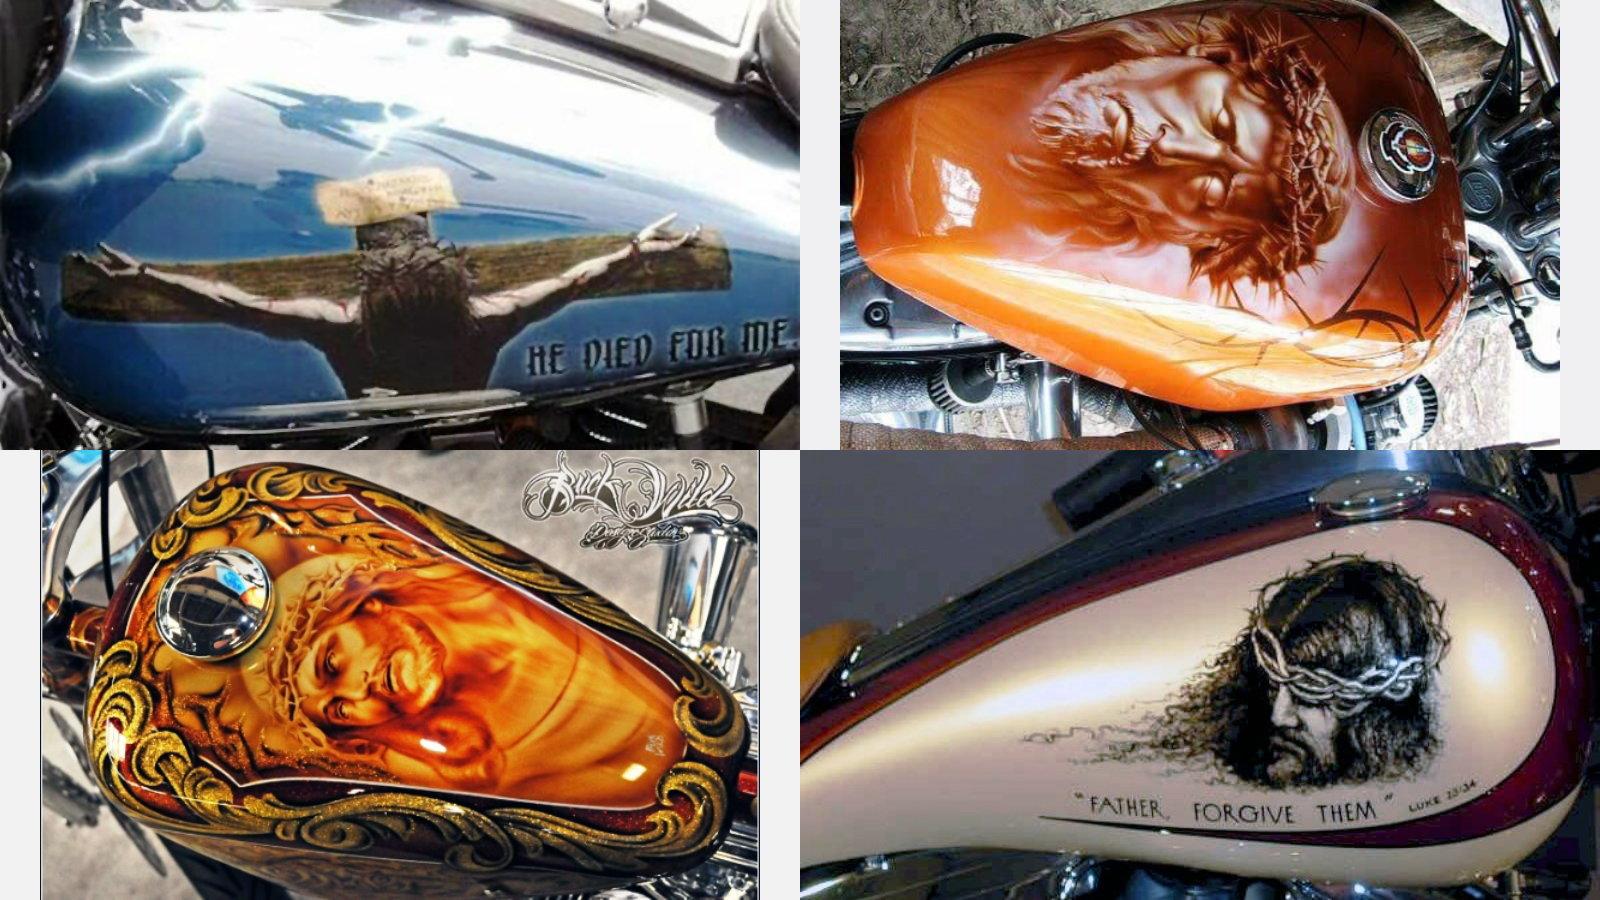 7 Jesus Themed Harley Davidson Paint Jobs For Easter Hdforums